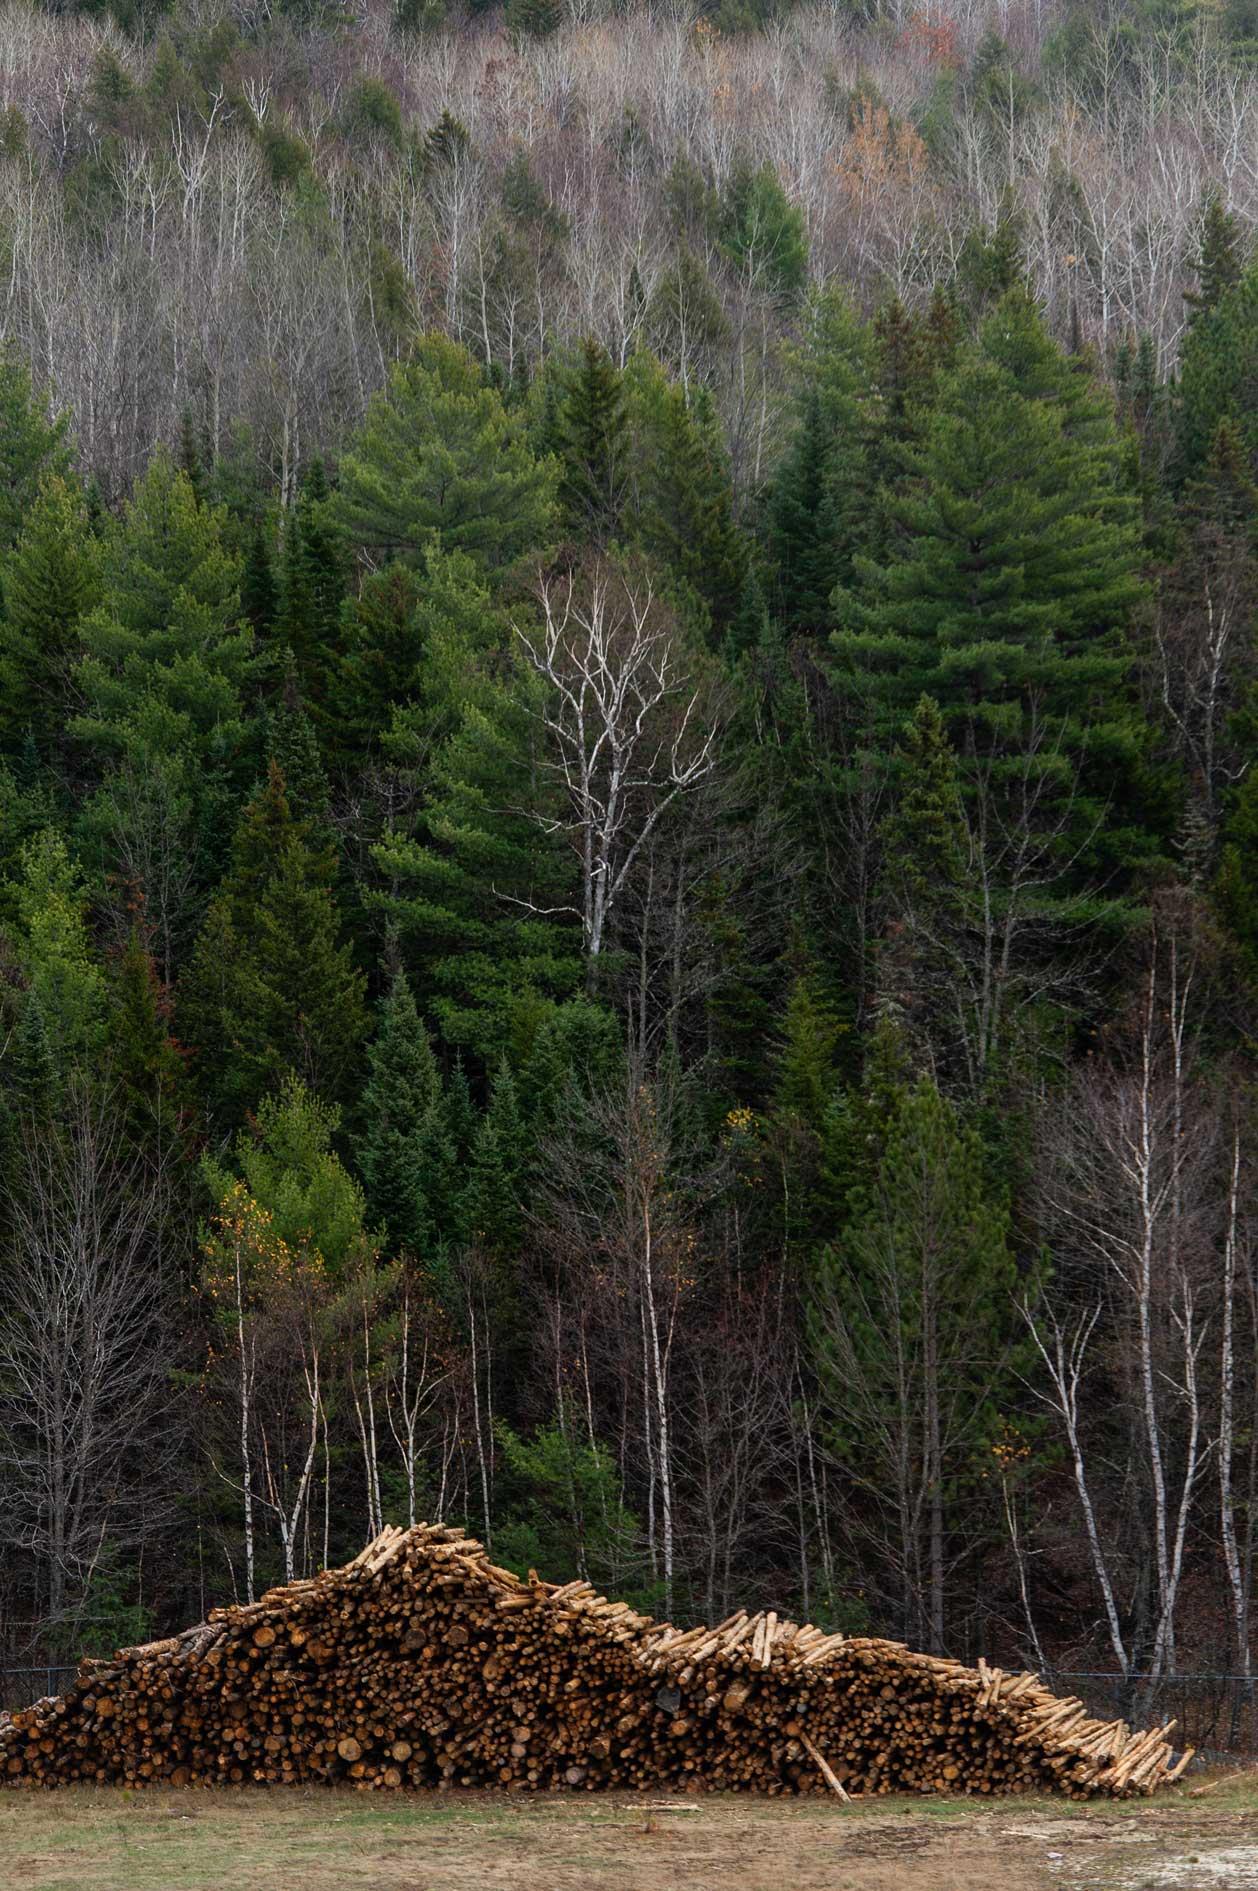 ReEnergy Stratton Biomass